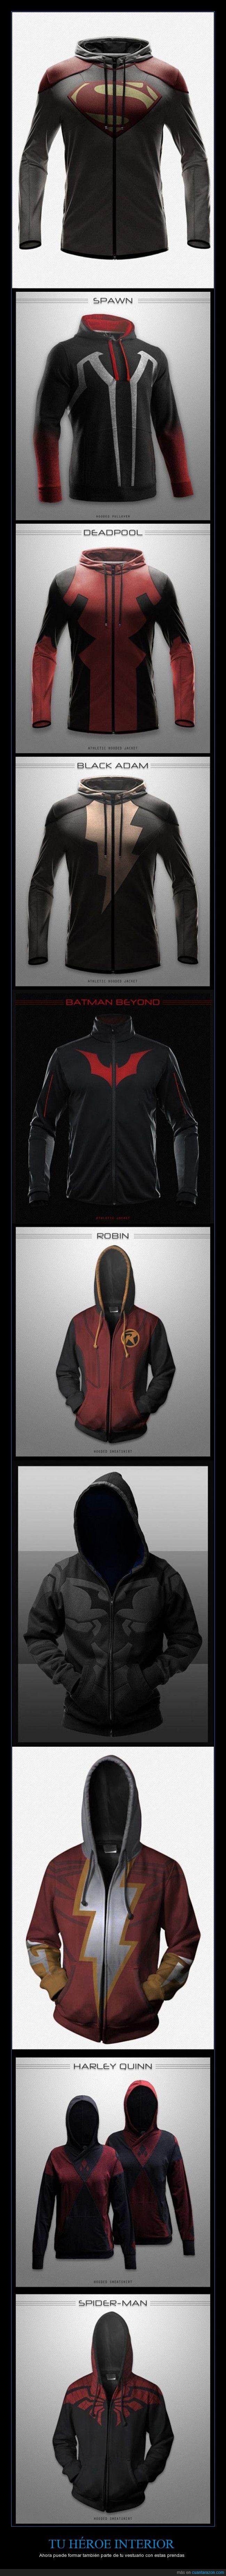 Batman,chaqueta,Deadpool,Flash,Harley Quinn,heroe,Robin,Spiderman,sudadera,Superman